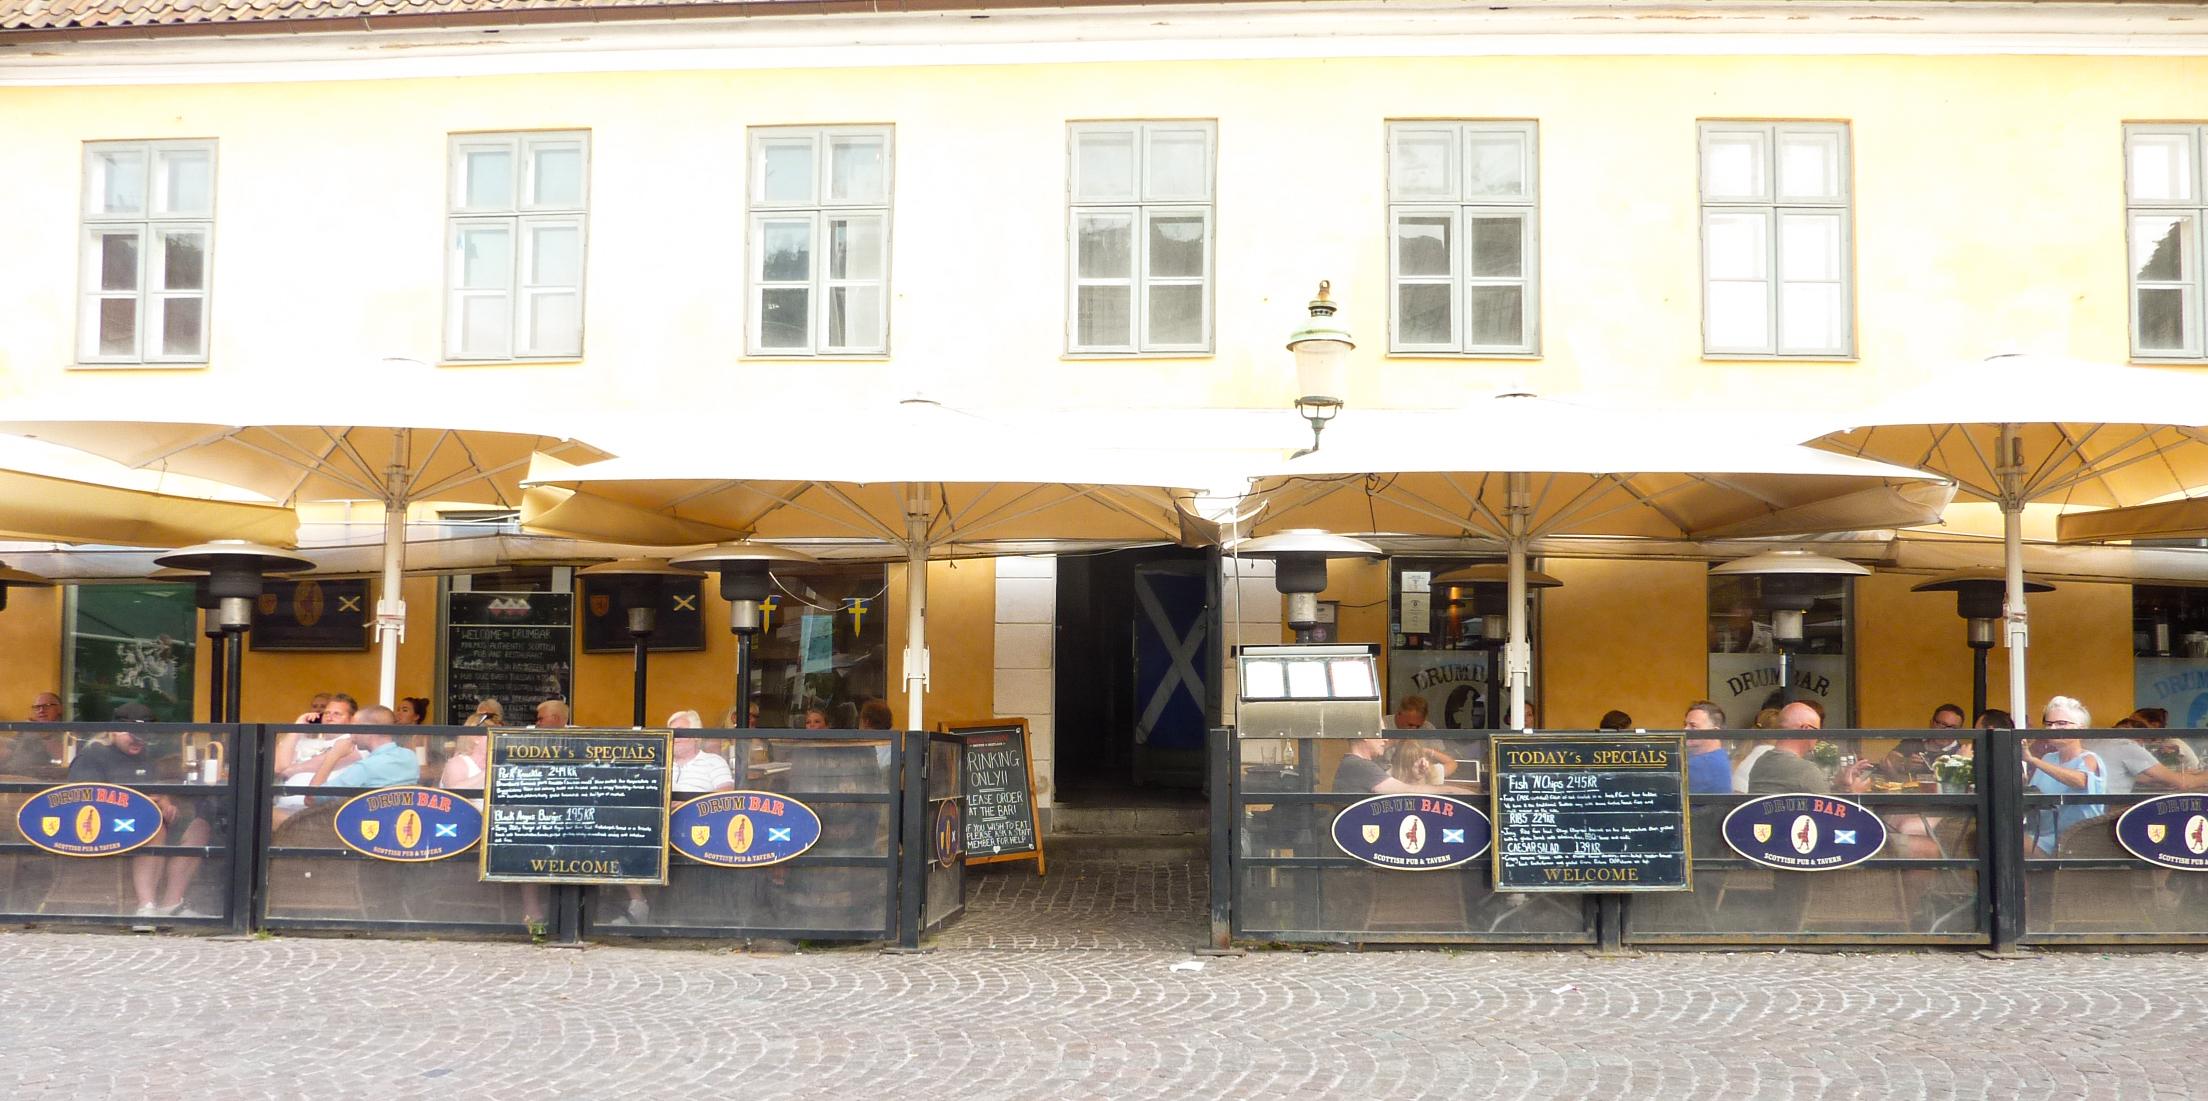 Drumbar Lilla Torg, Malmö